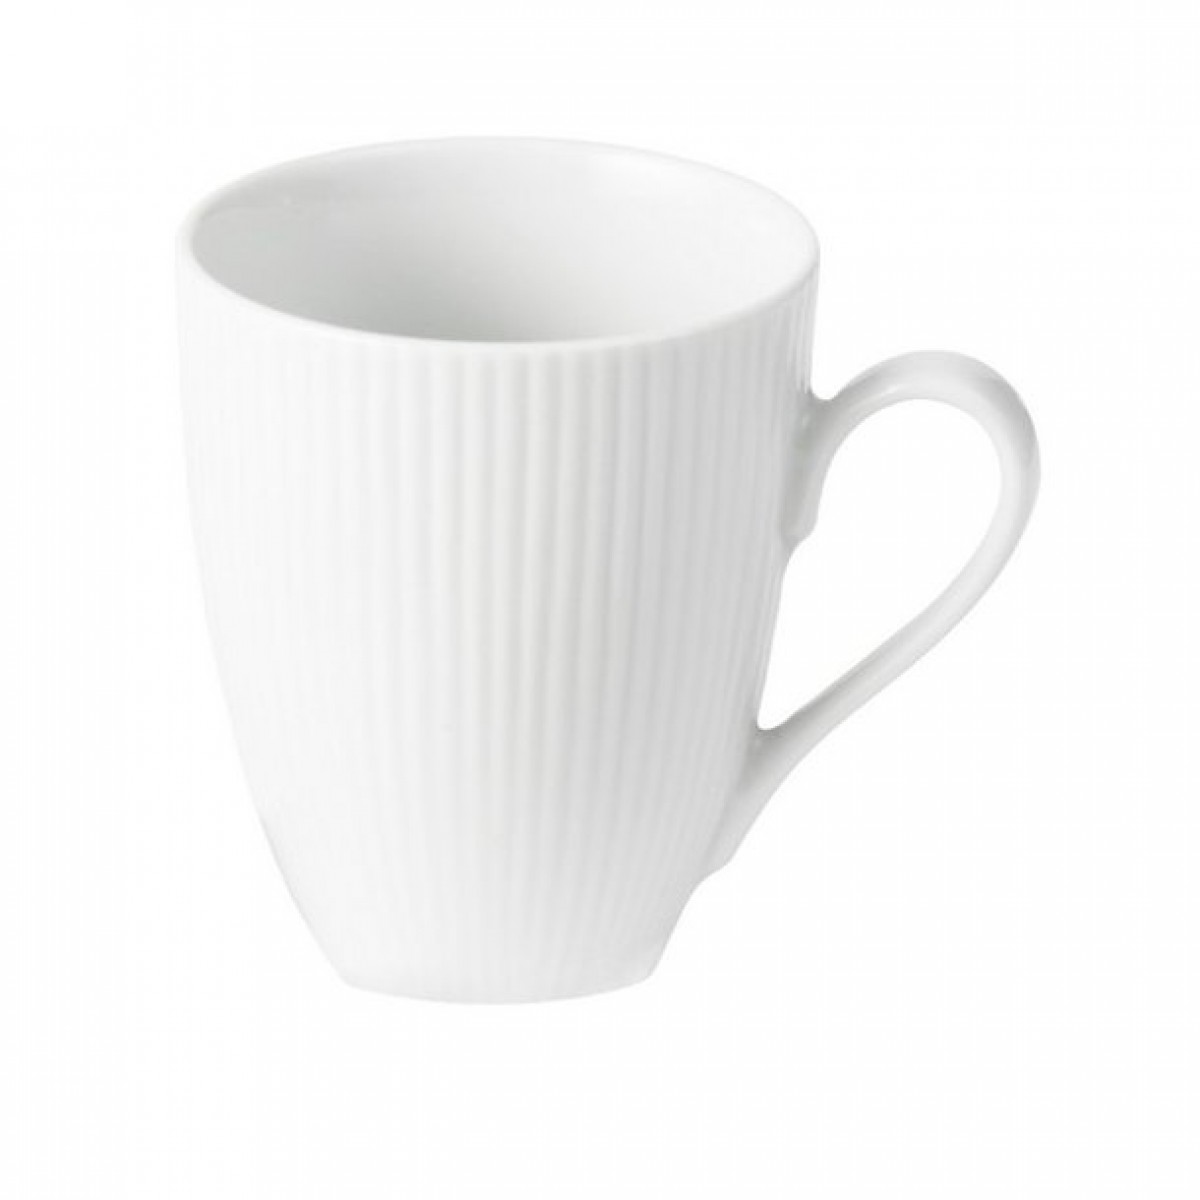 AIDA Groovy procelæn krus 30 cl. porcelæn